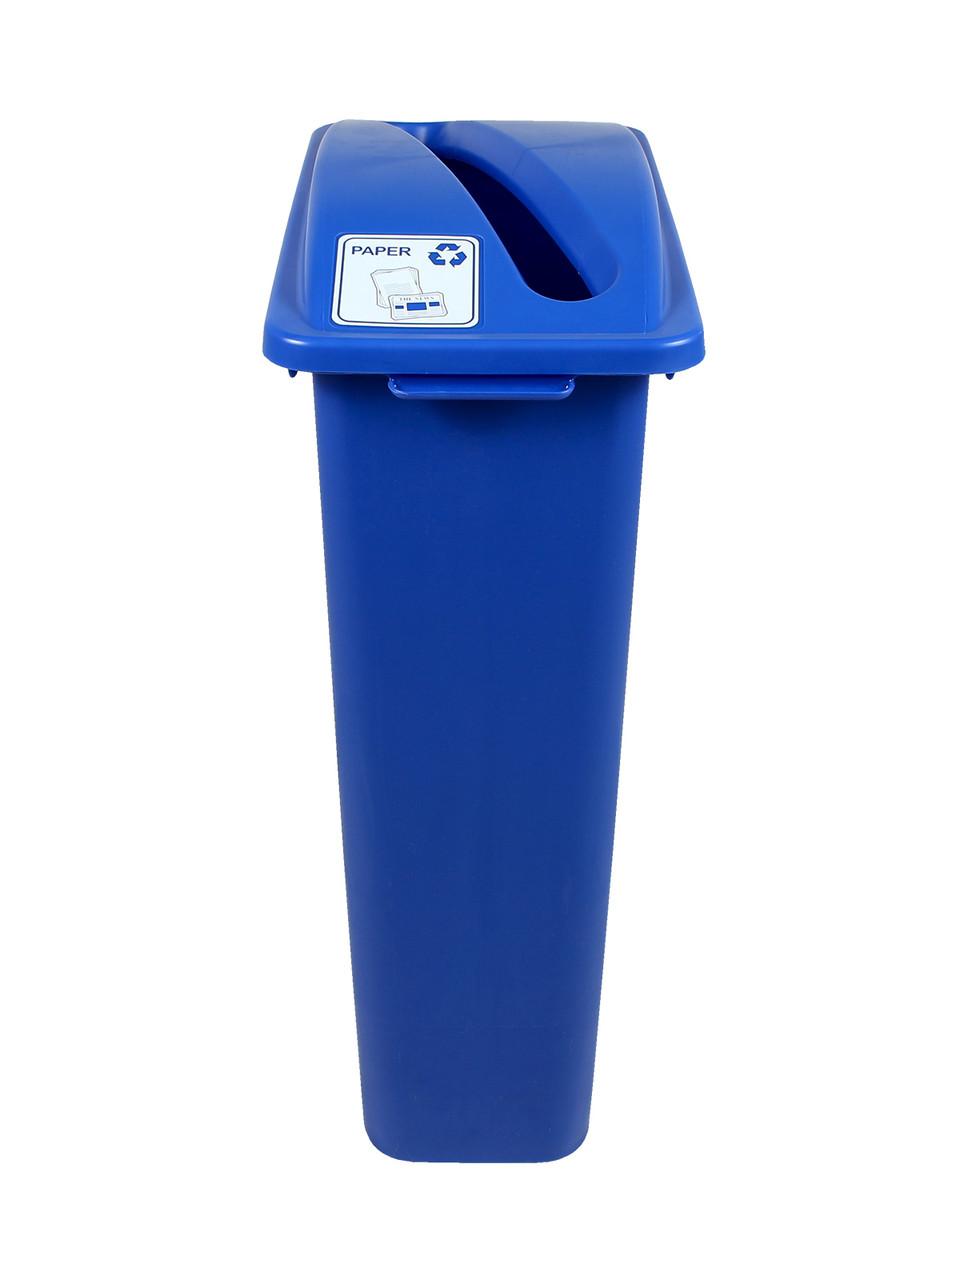 23 Gallon Blue Skinny Recycle Bin (Paper)